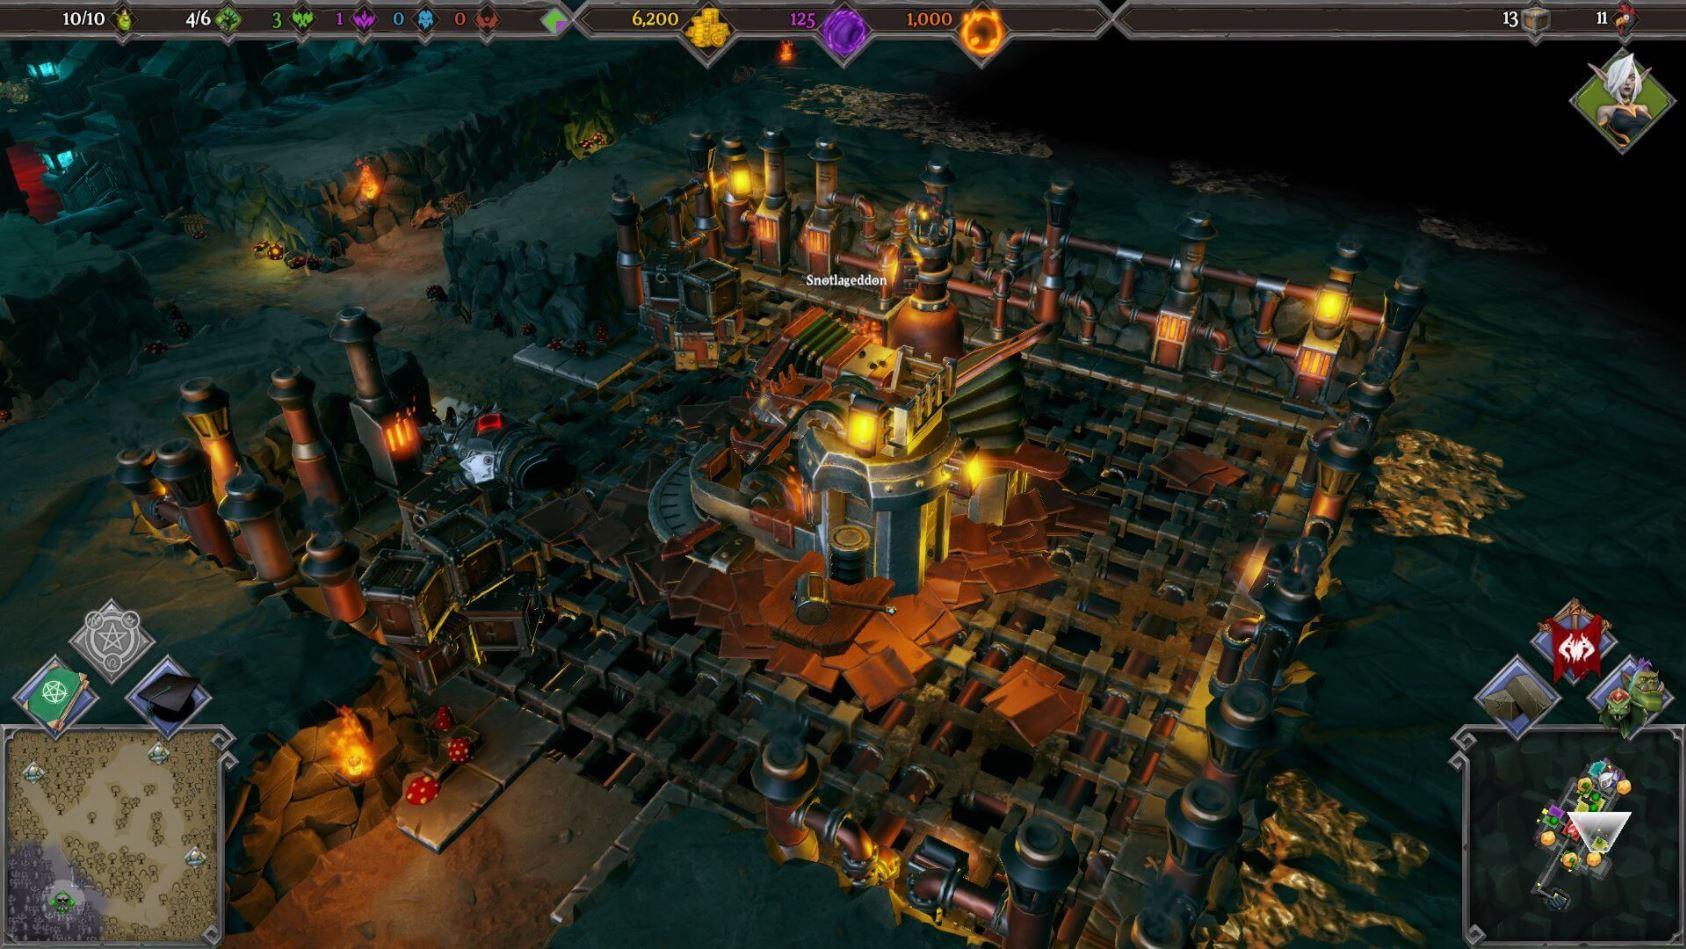 Dungeons 3 sur Steam promo dungeons 2 screen146447